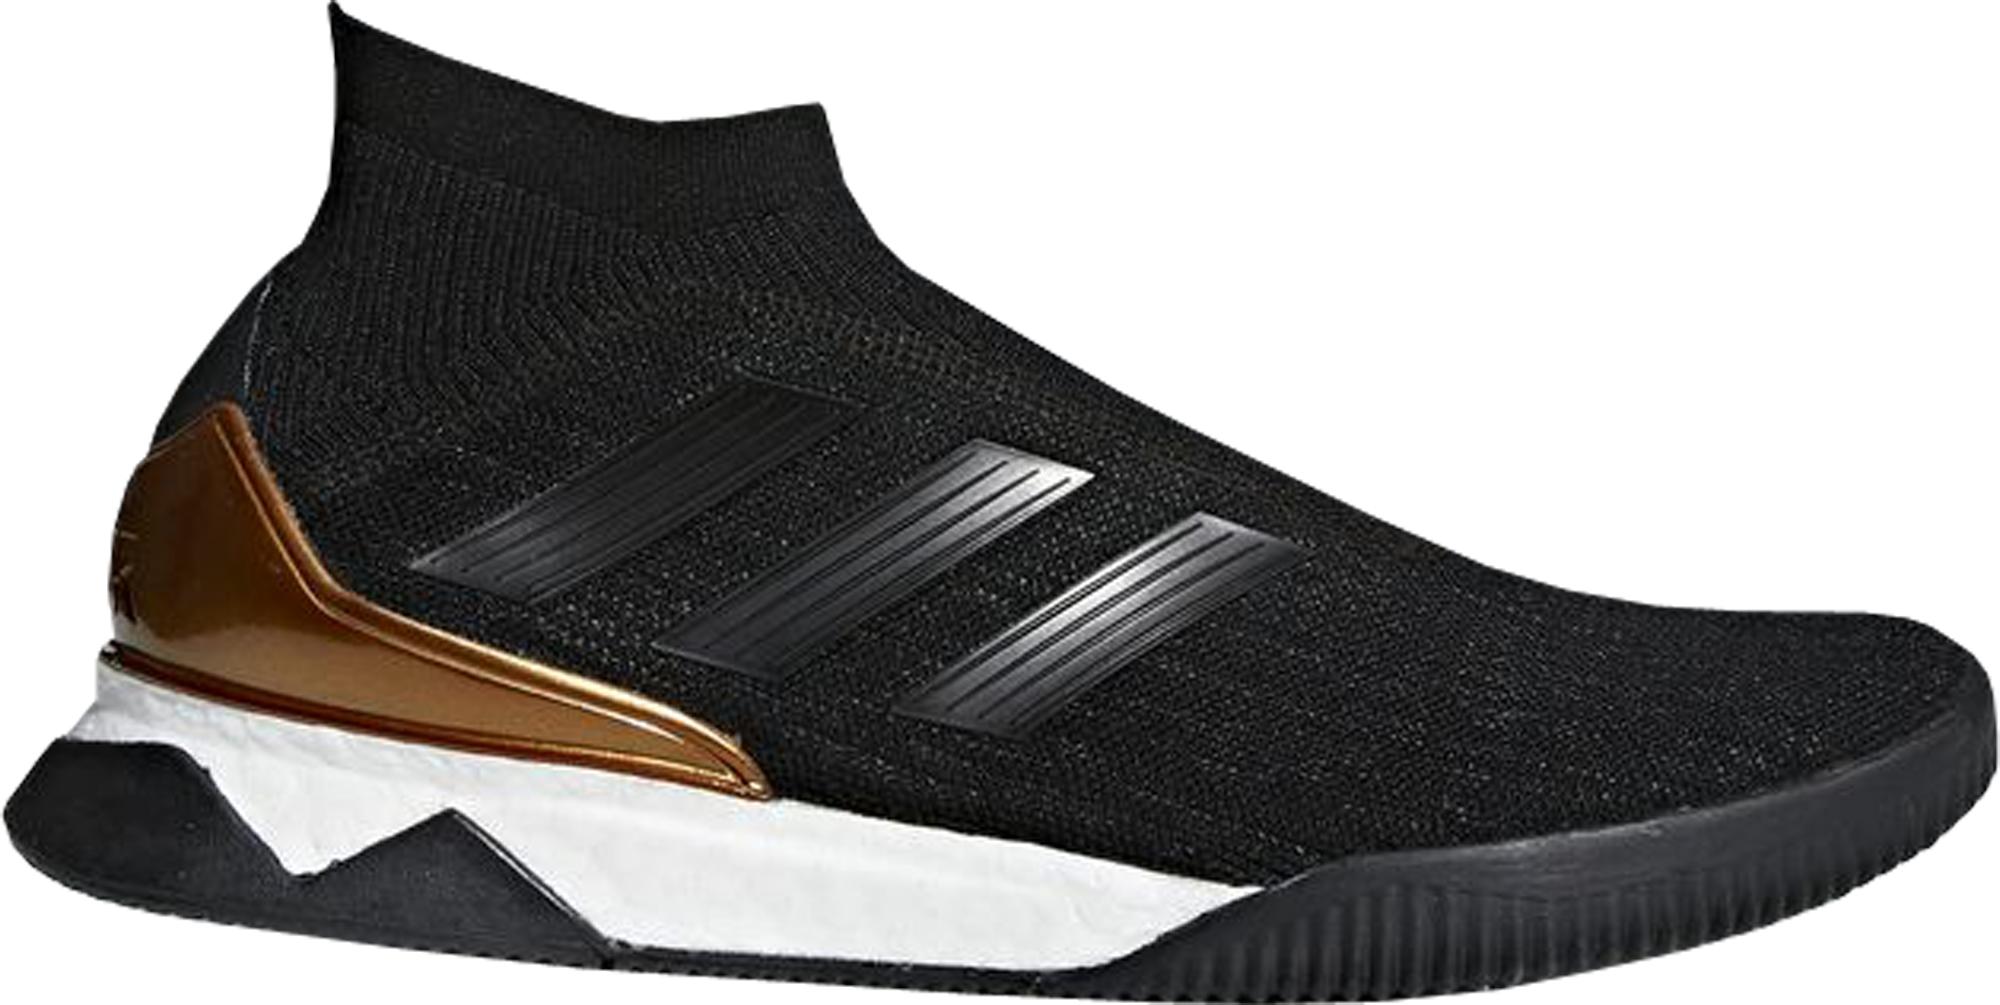 adidas Predator Tango 18+ Black Gold